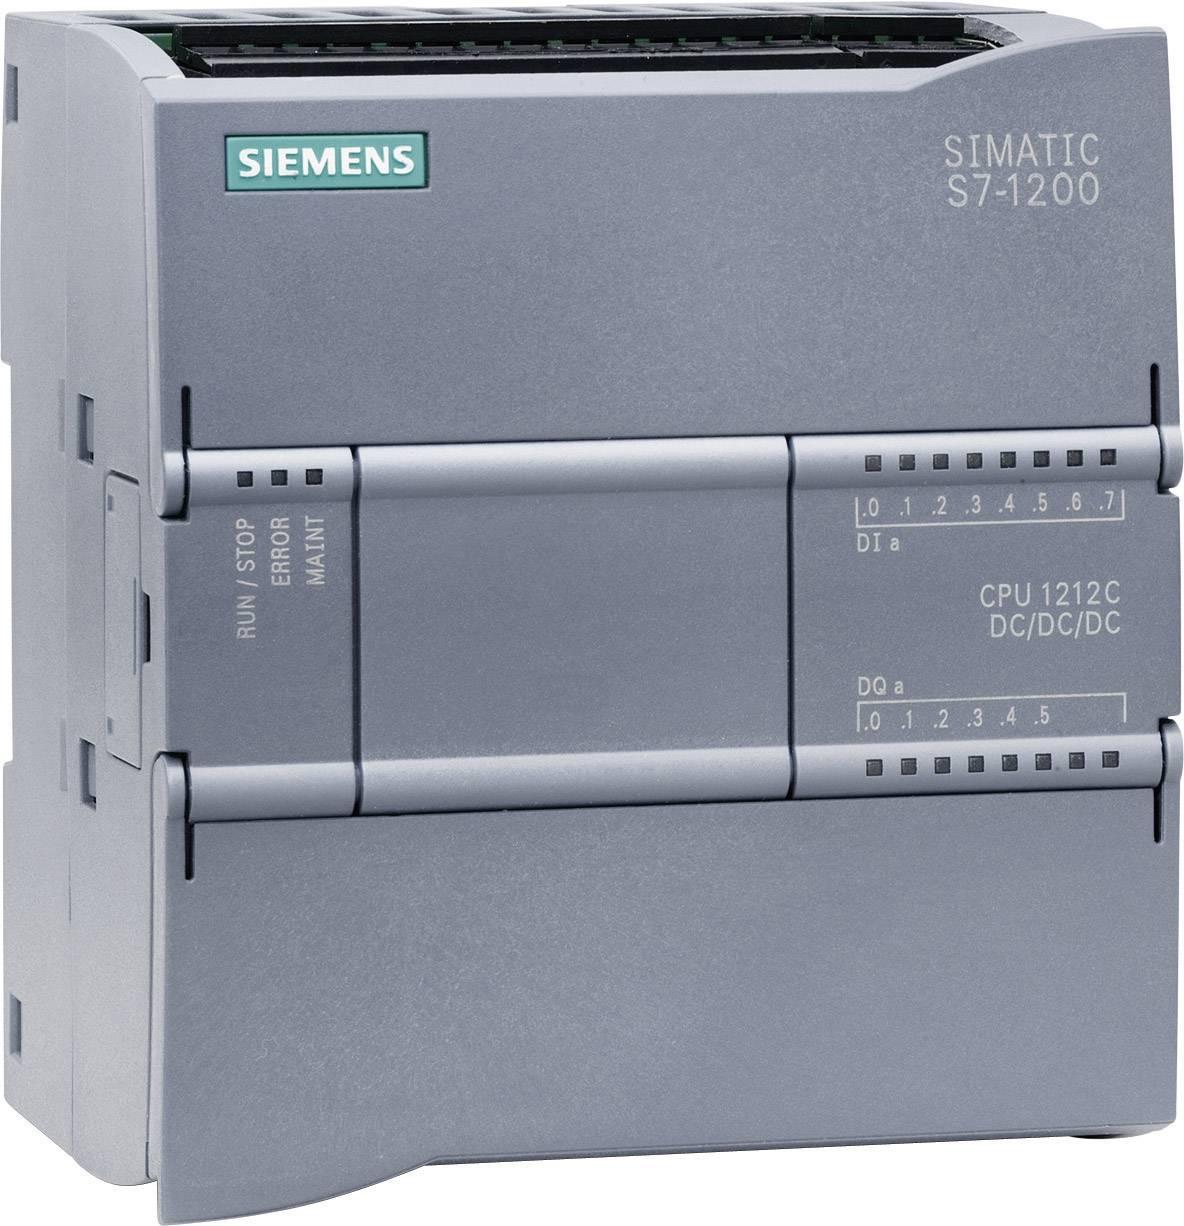 Riadiacimodul Siemens CPU 1212C DC/DC/DC, 6ES7212-1AE31-0XB0, 24 V/DC